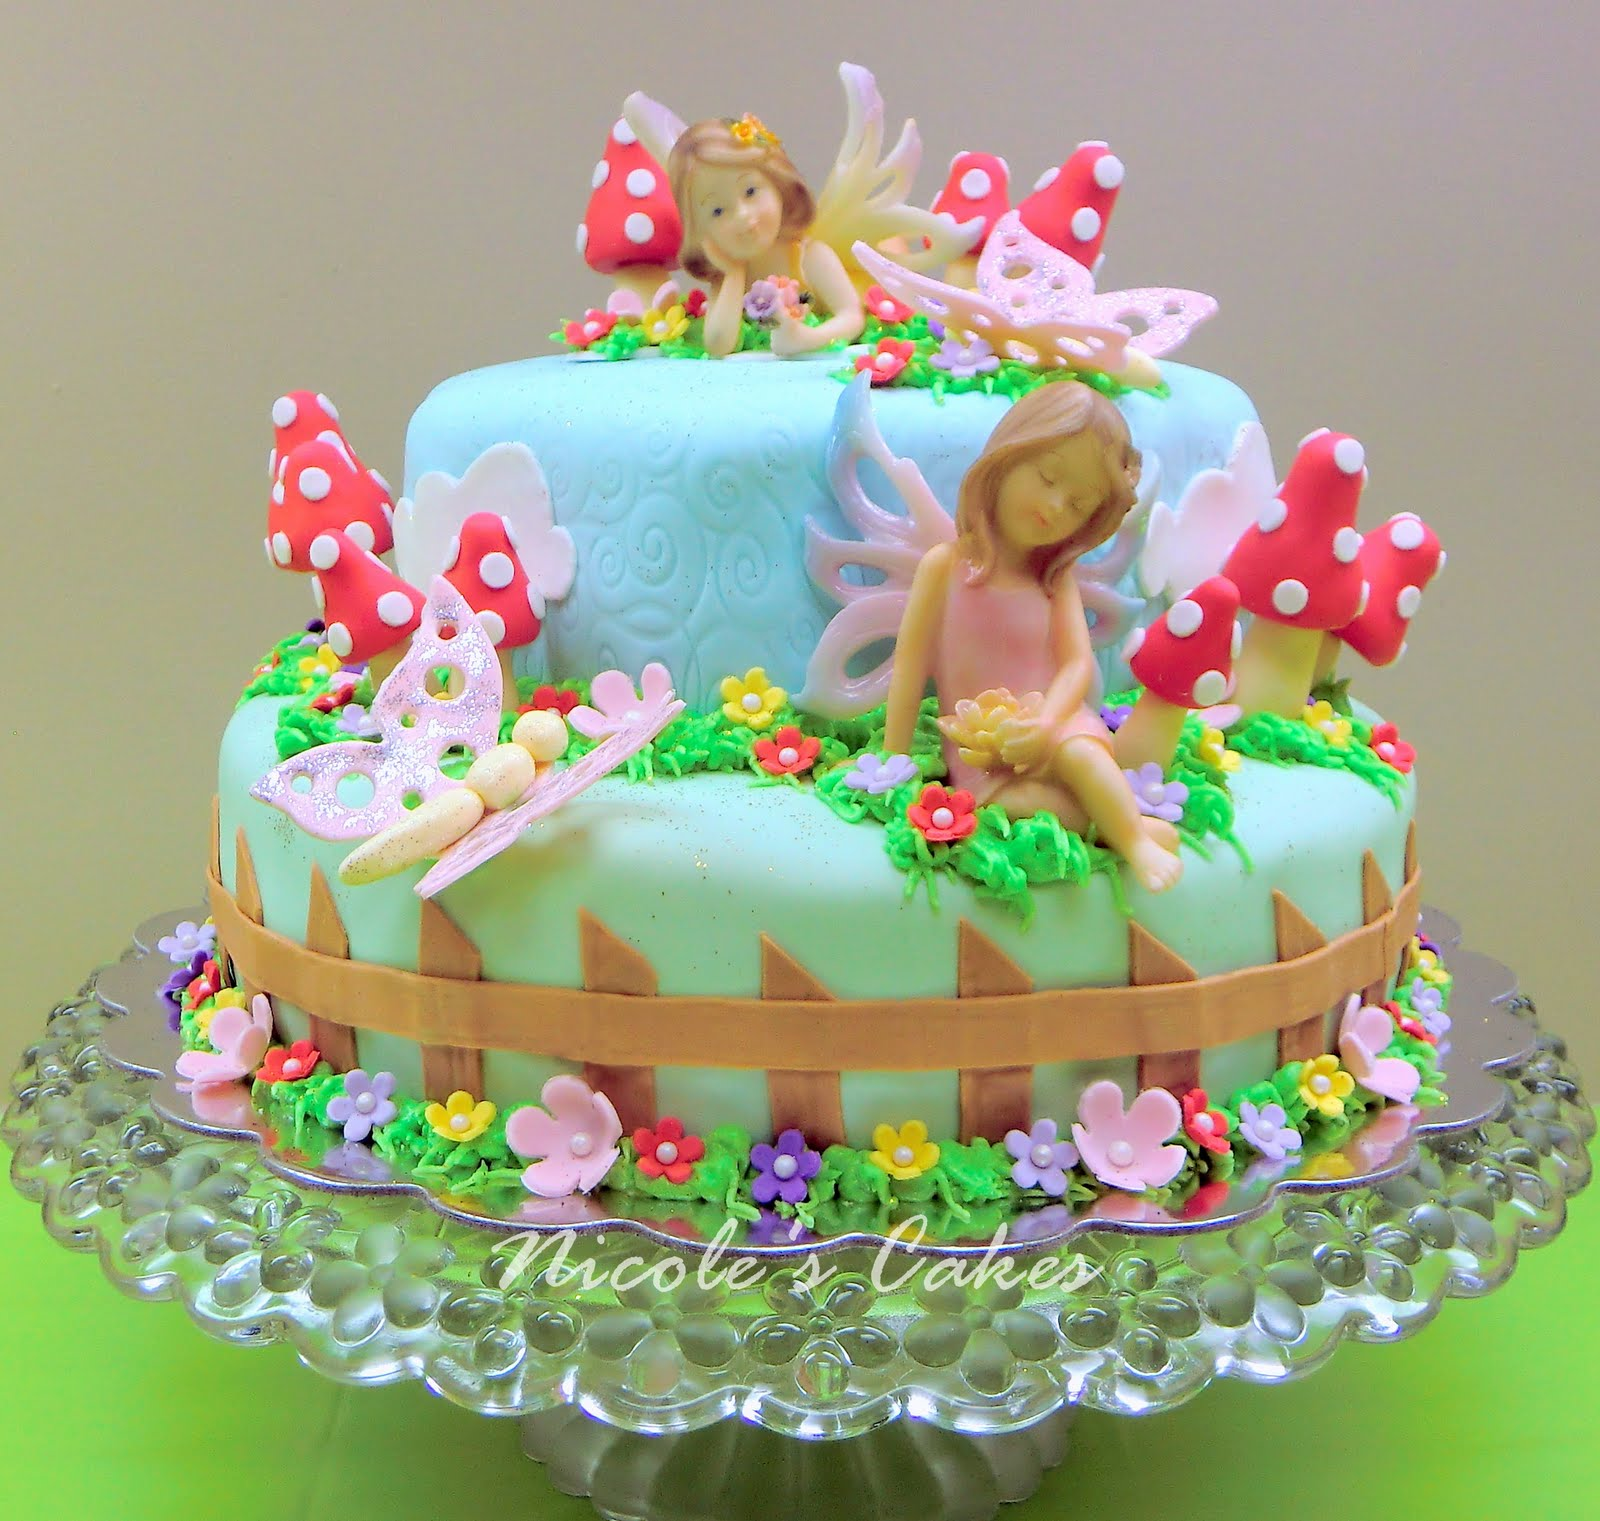 Garden Party Cake Images : On Birthday Cakes: A Fairy Garden Cake!